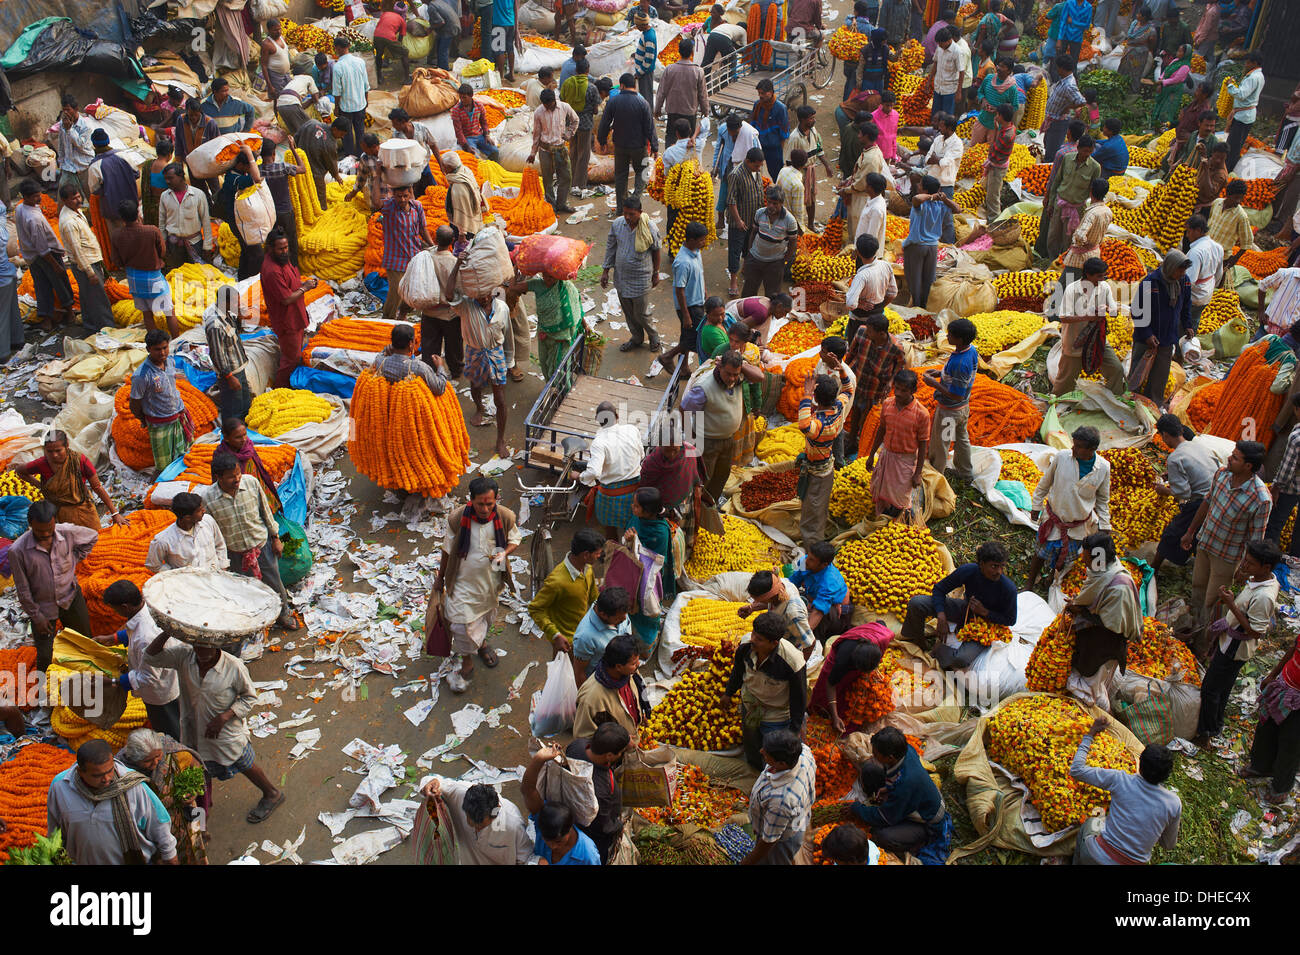 Mullik Ghat flower market, Kolkata (Calcutta), West Bengal, India, Asia - Stock Image